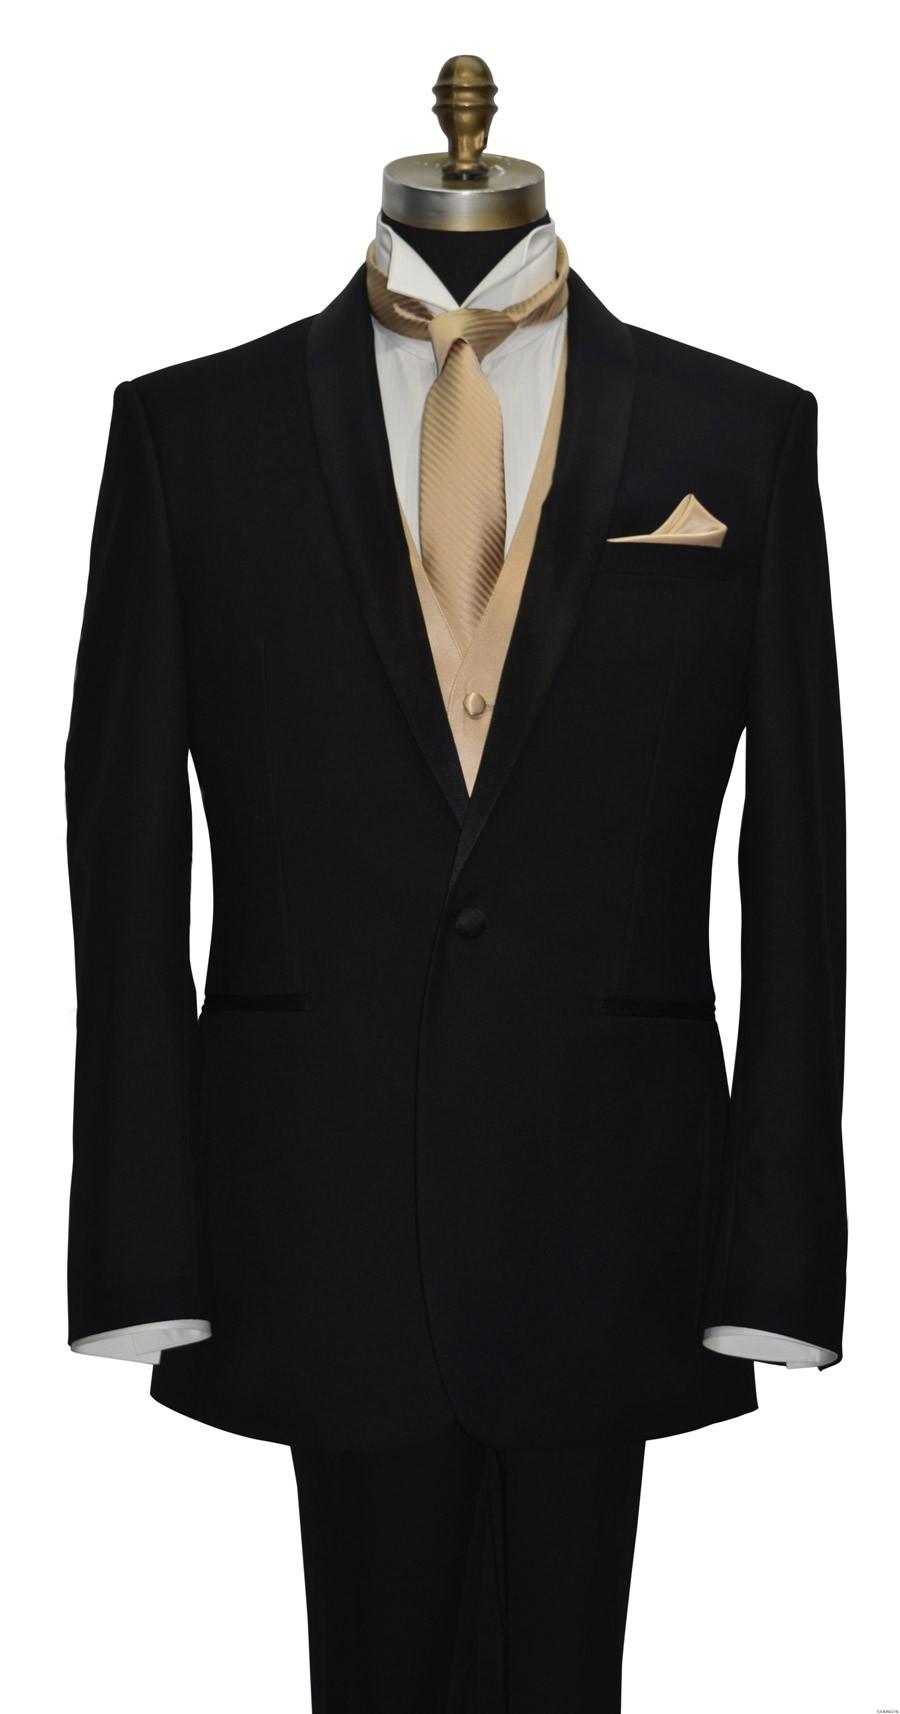 golden vest with golden long dress tie for men and boys